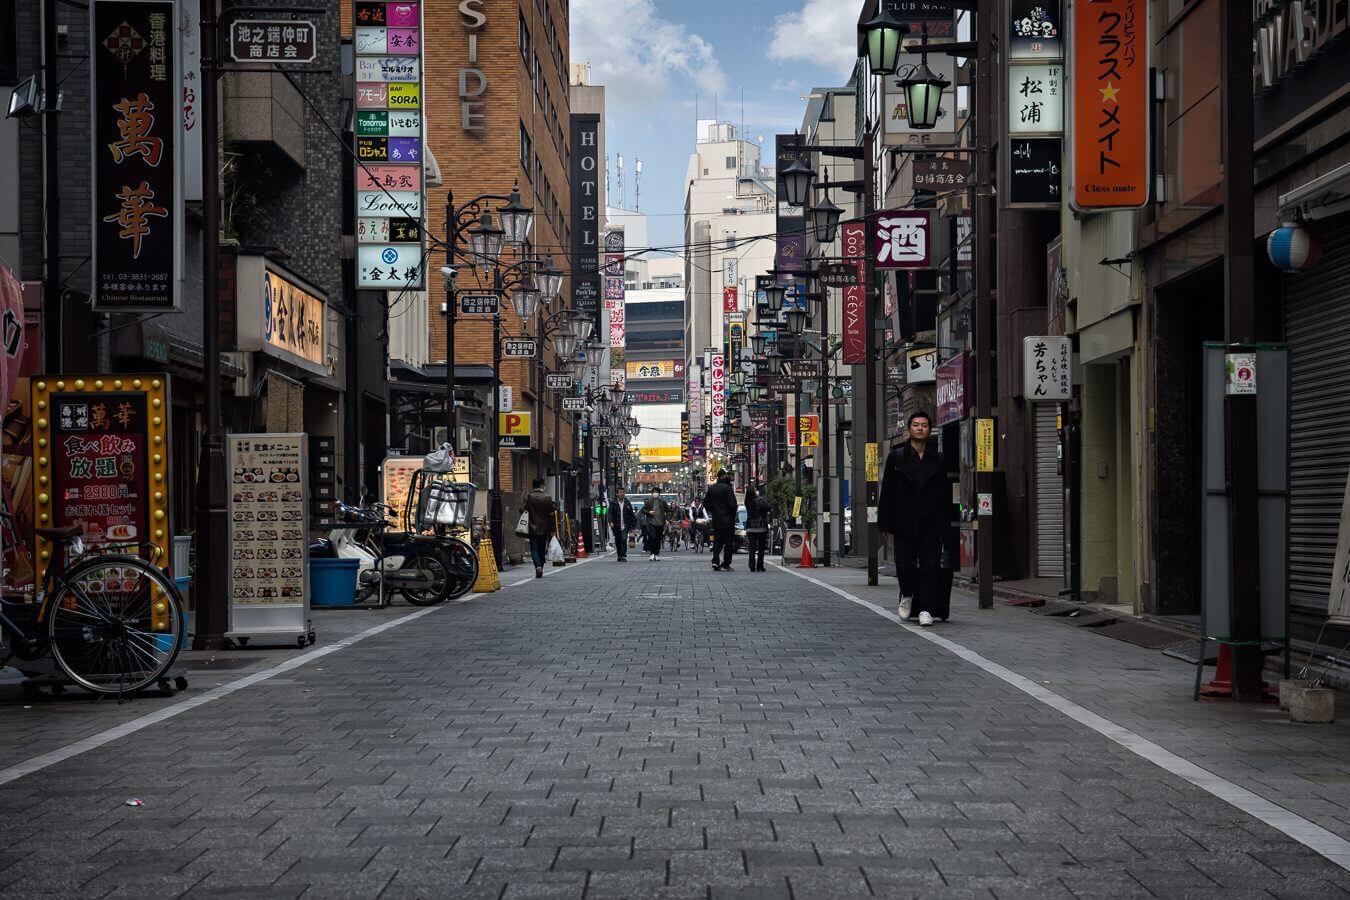 Street in Osaka, Japan - Photo by Zed Sindelar of CuriousZed Photography